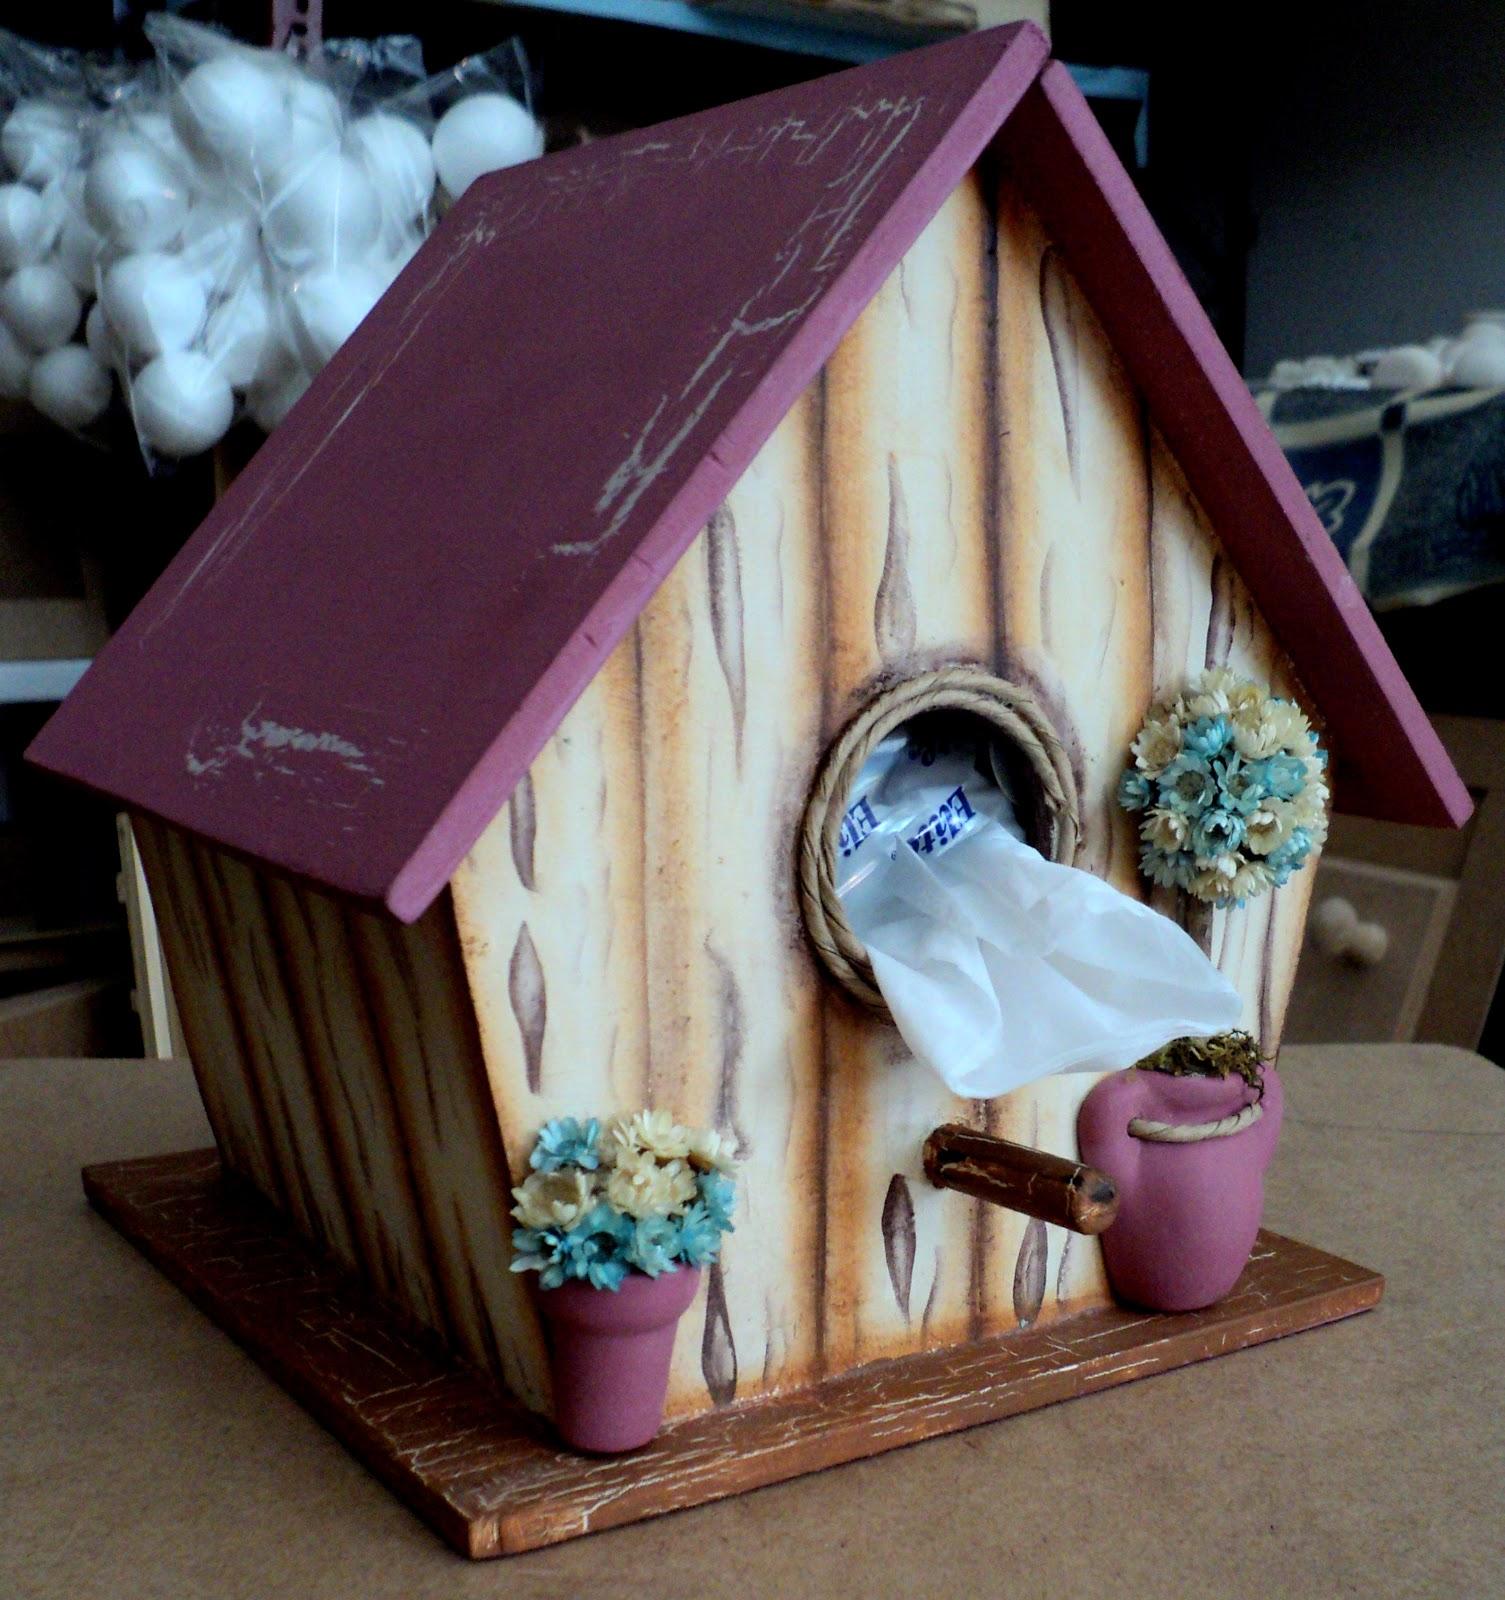 Taller de pintura decorativa casita de pajaros portapa uelos - Casita para pajaros ...